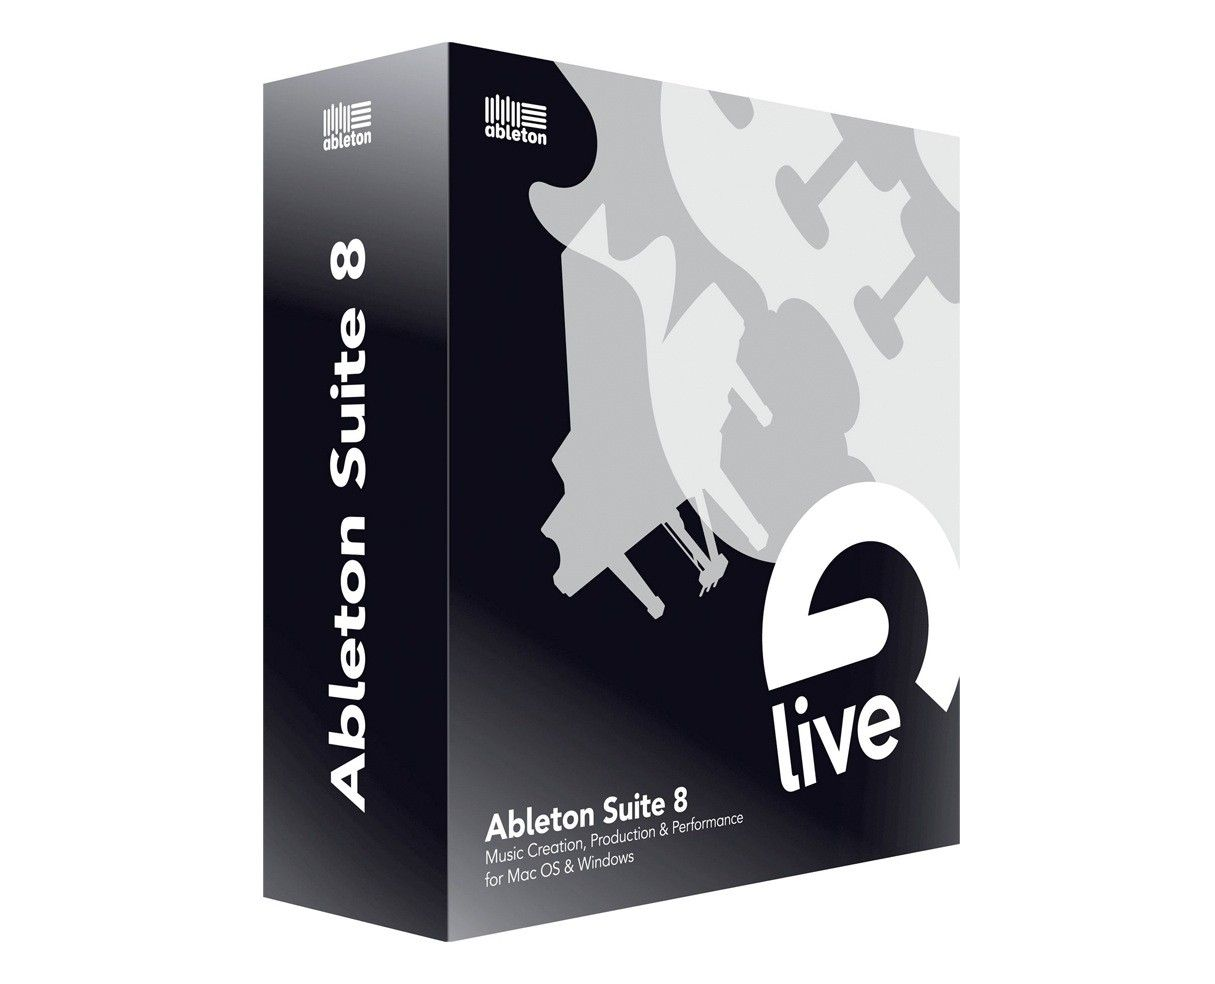 My daw music software ableton live digital audio